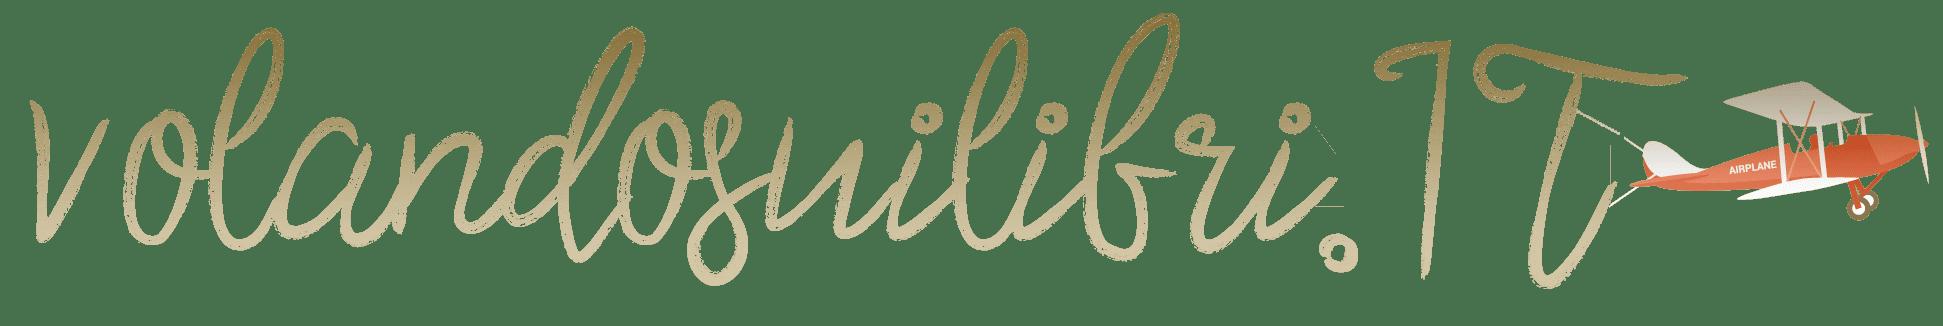 volandosuilibri logo4a